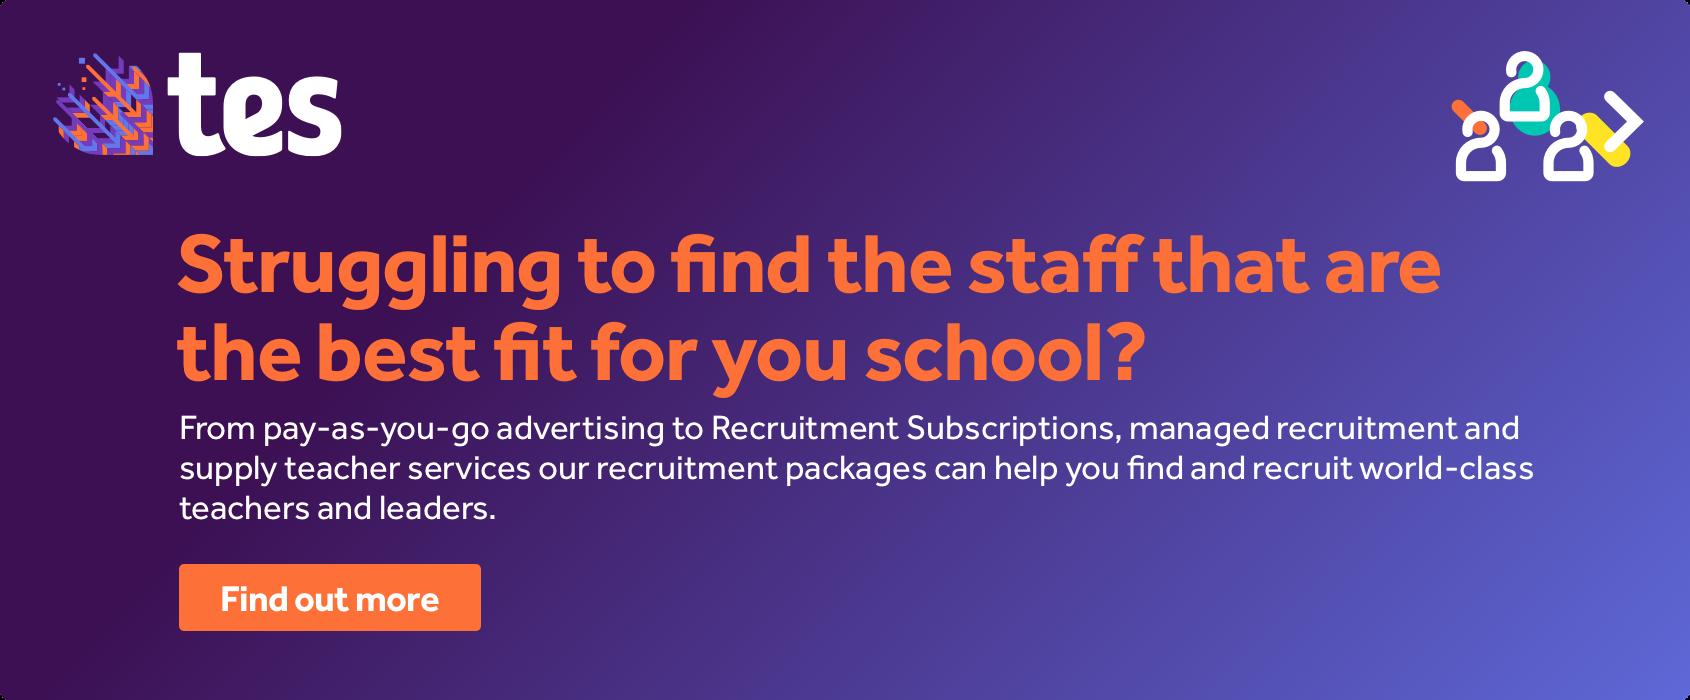 Tes recruitment